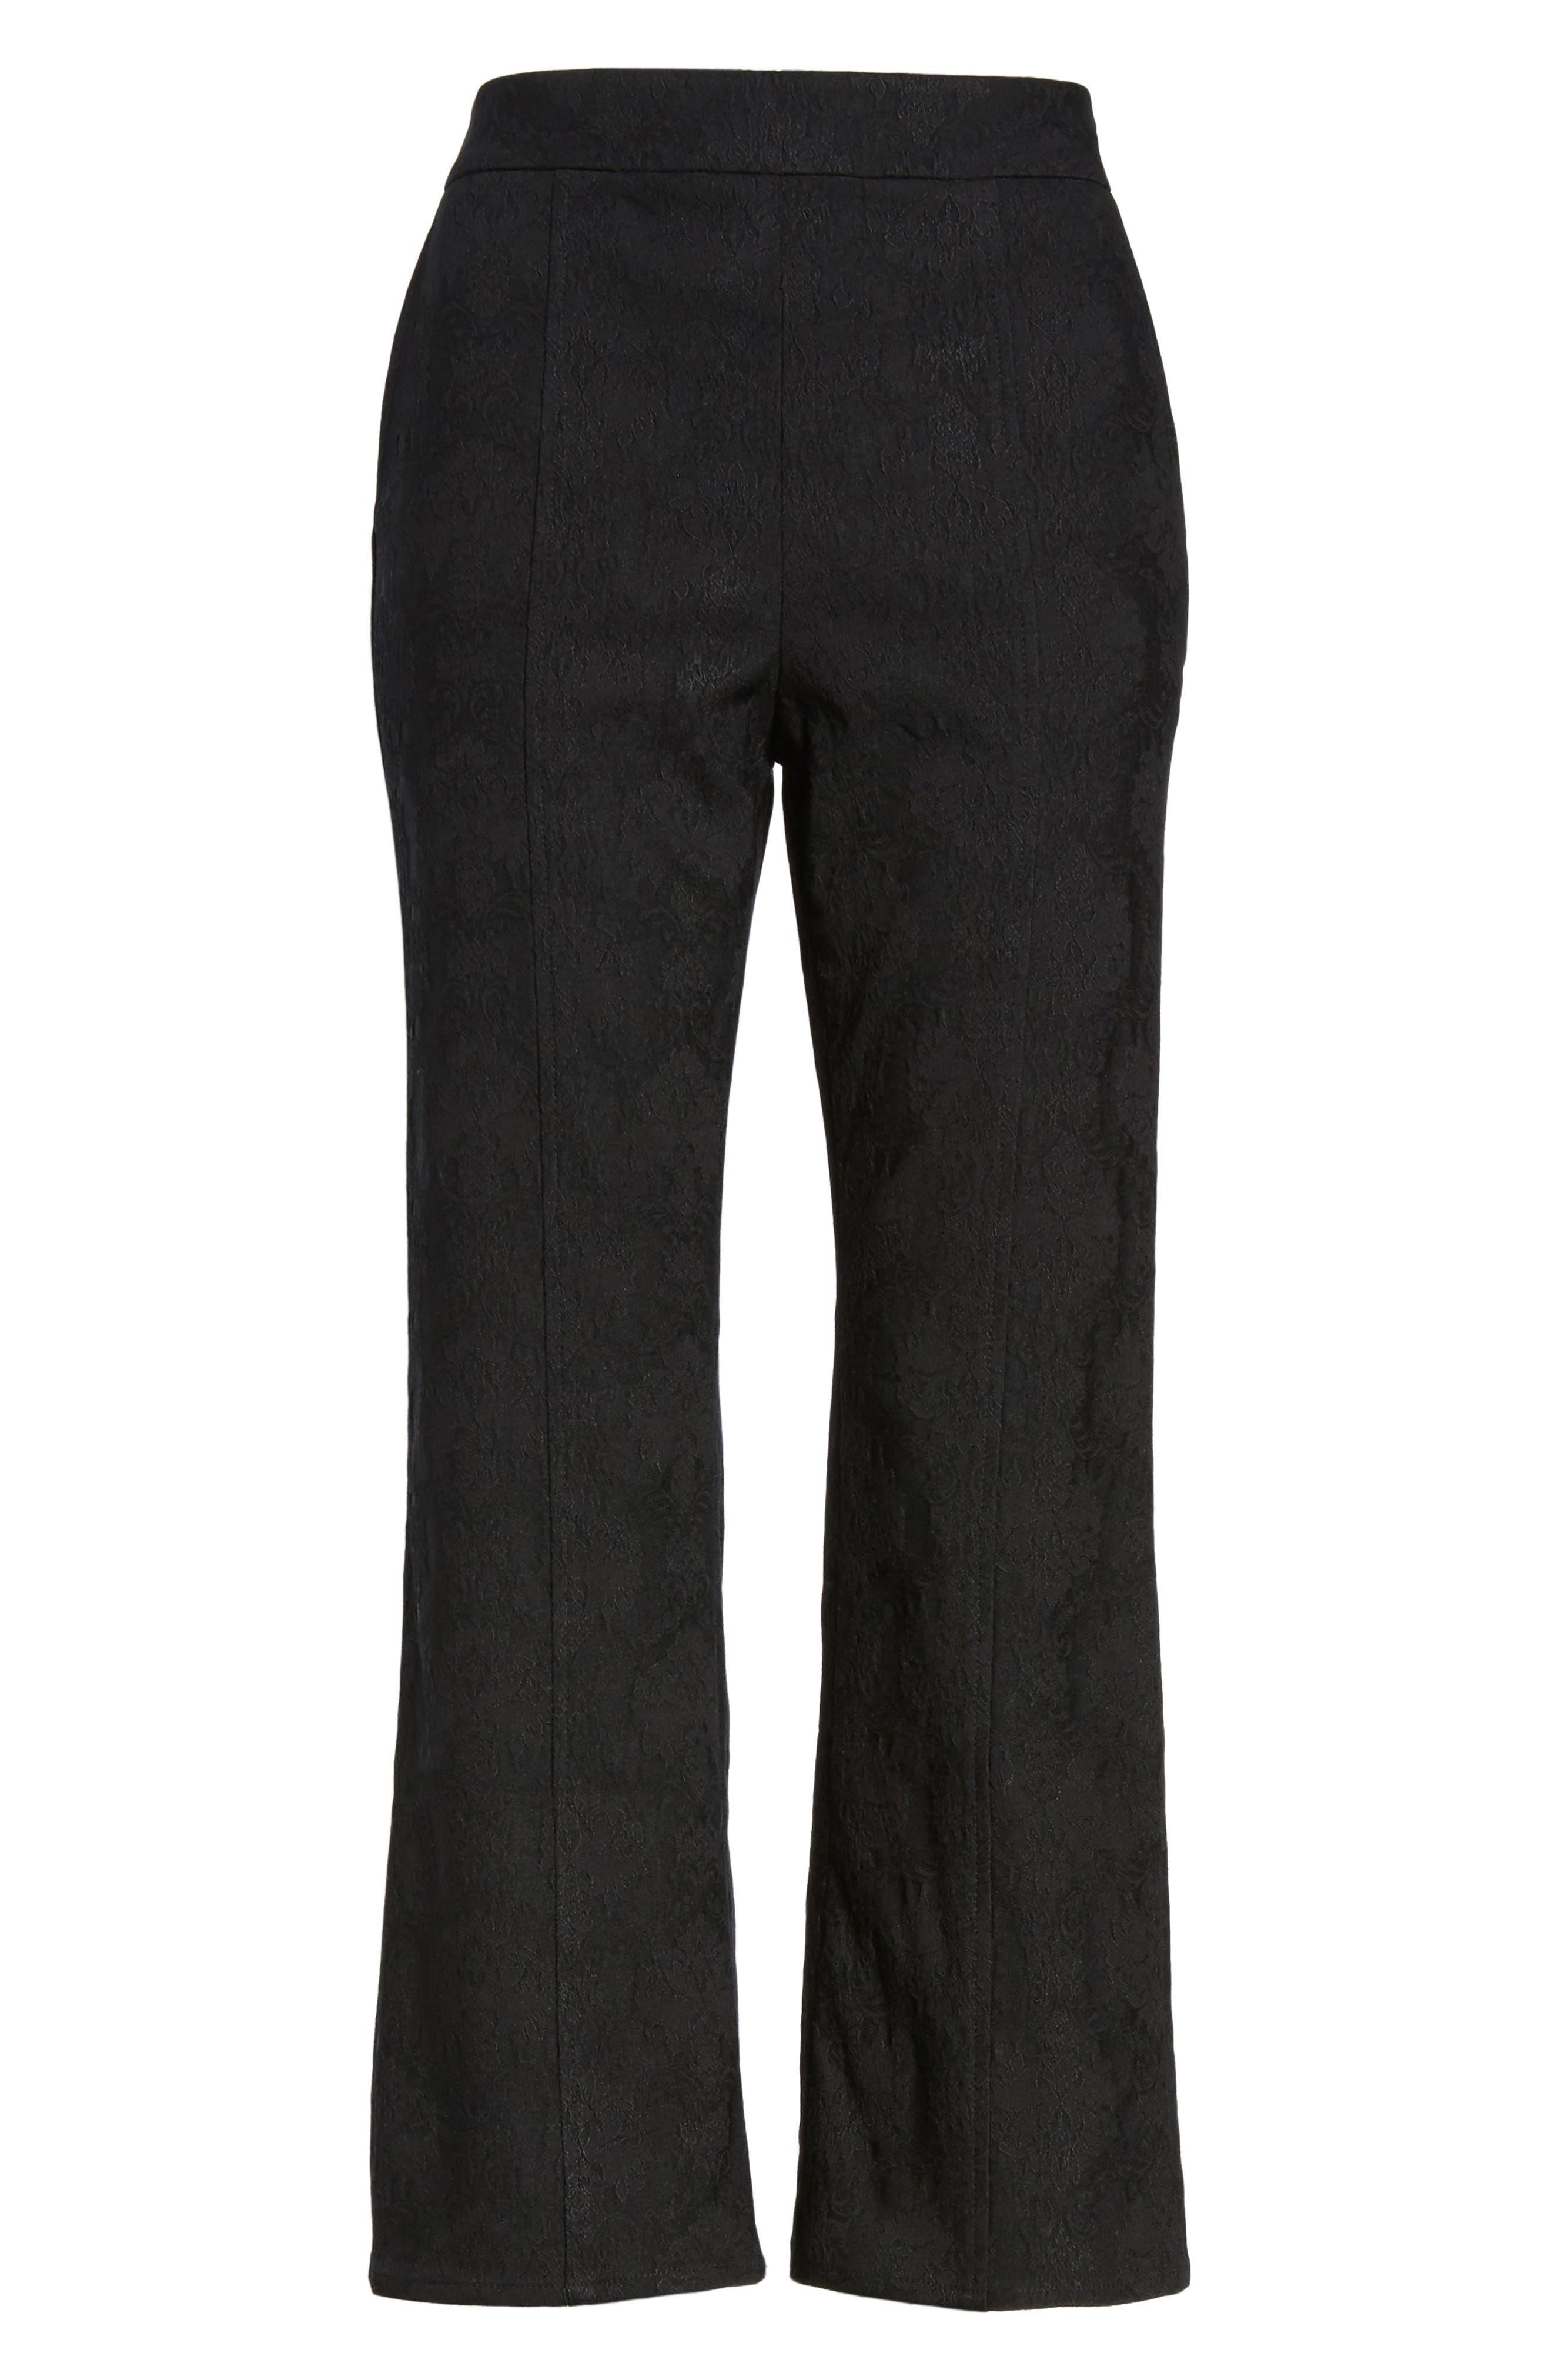 Leigh High Waist Crop Pants,                             Alternate thumbnail 7, color,                             Black